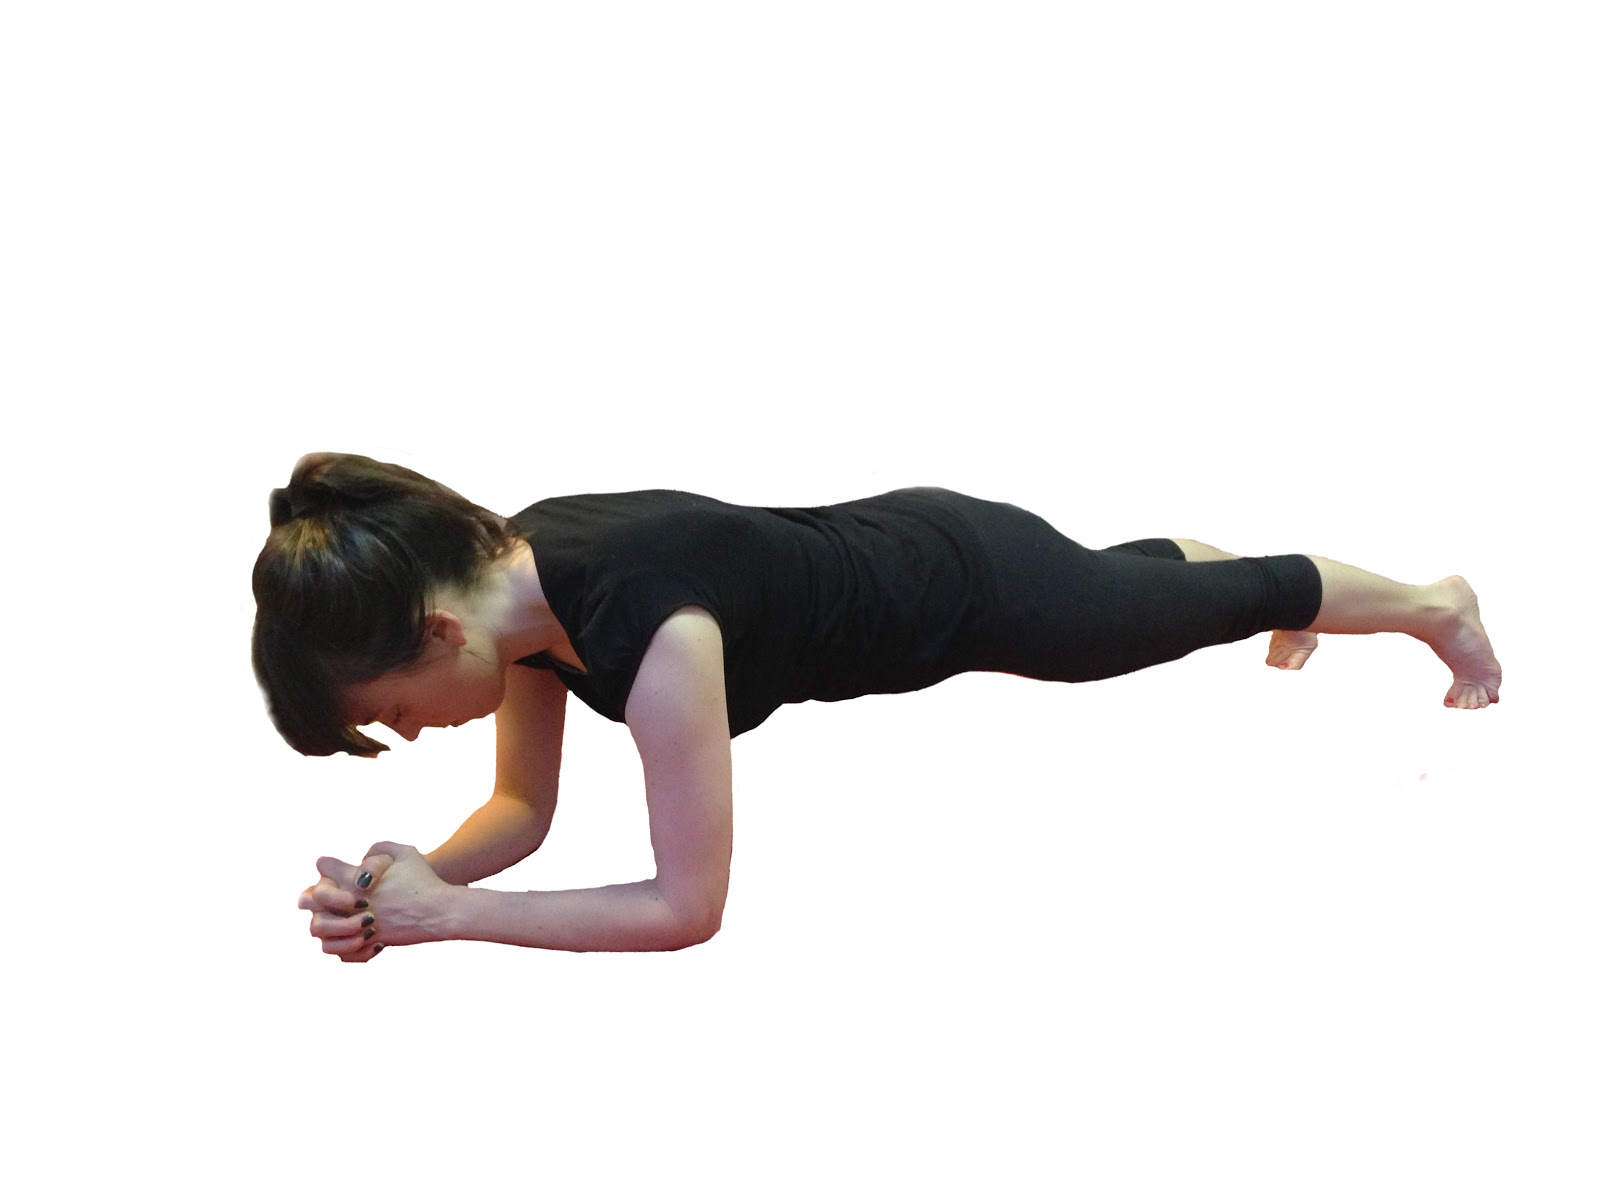 Plank further Plan...